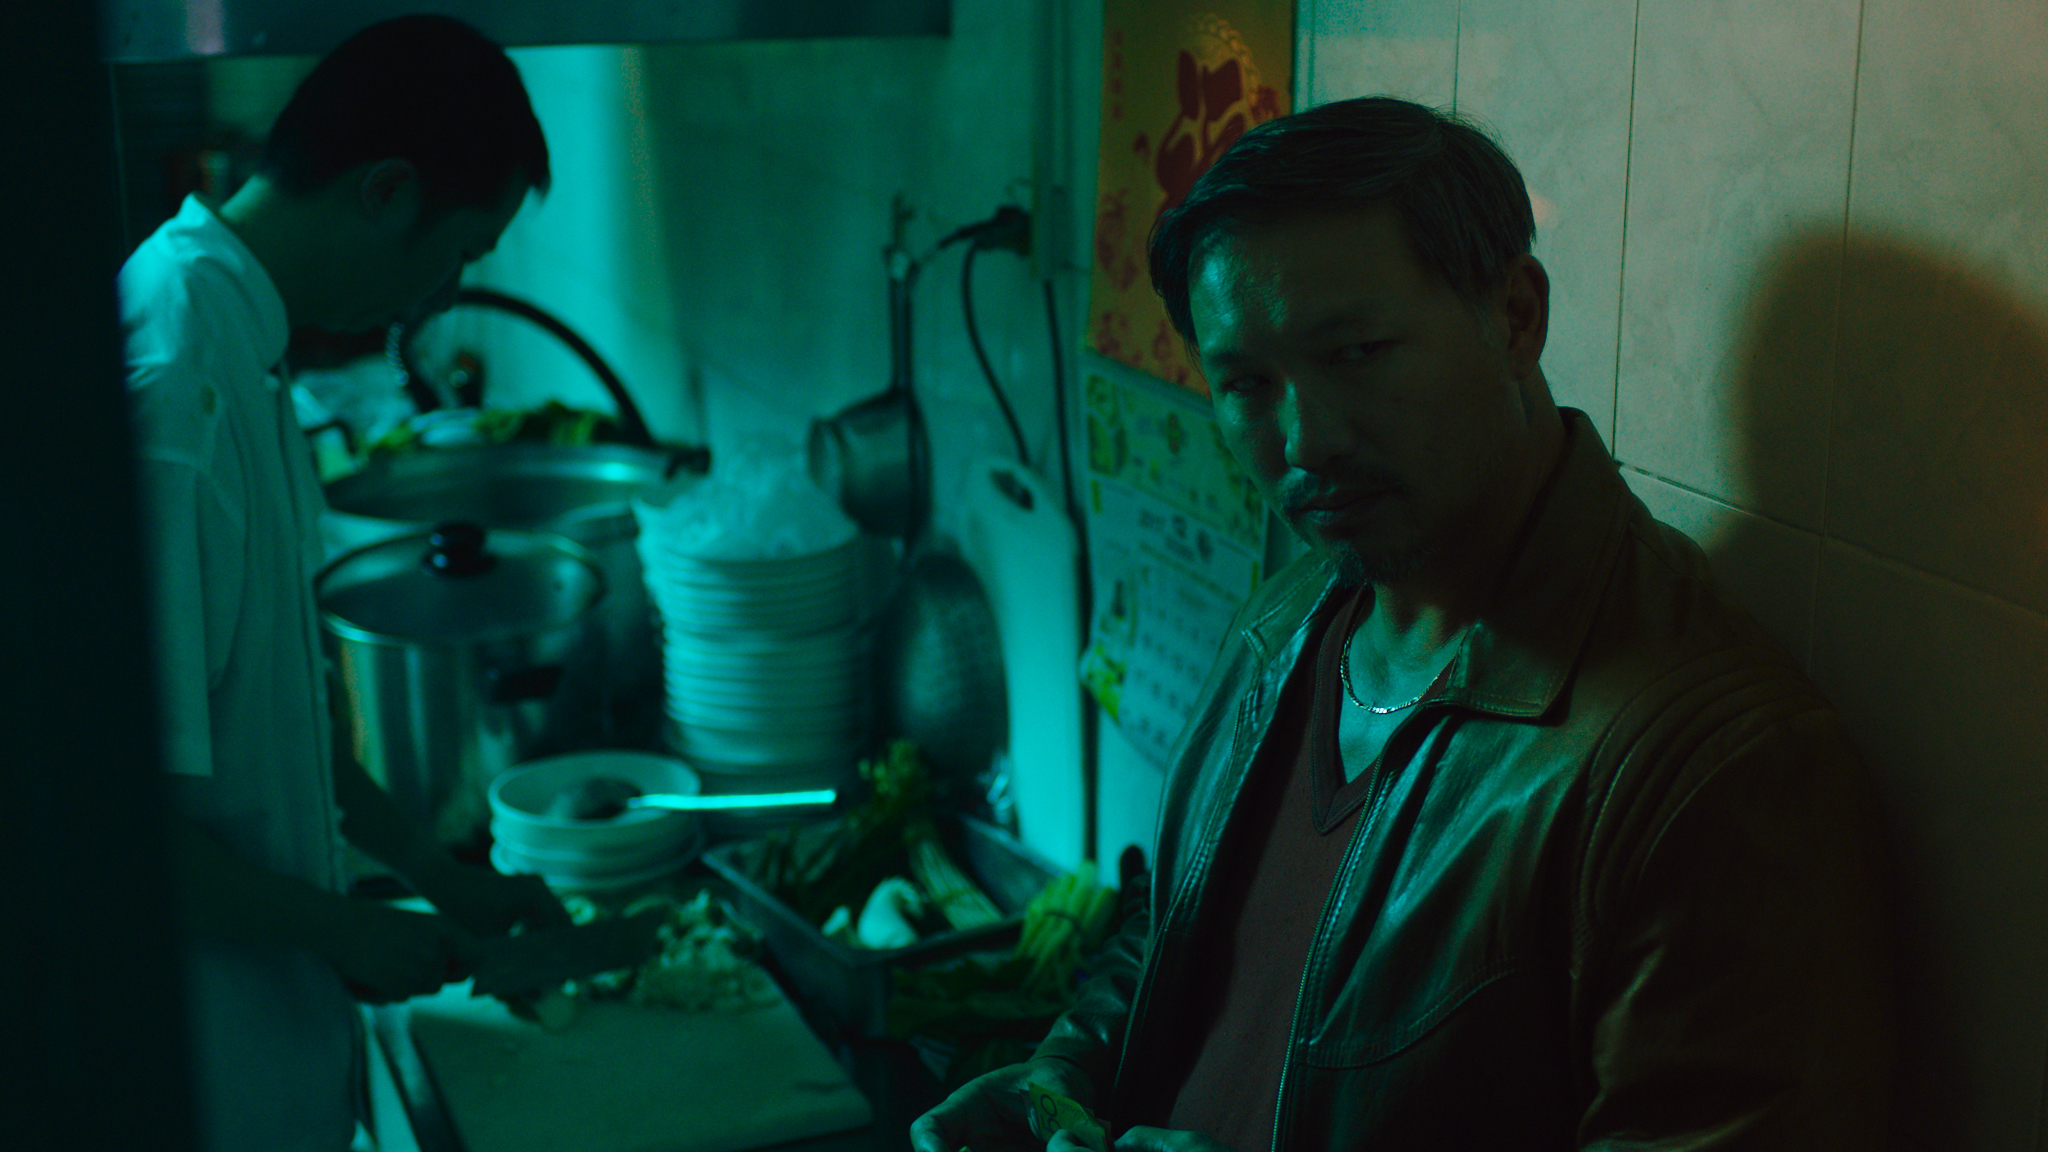 Jason Chong in 'Black Lips'